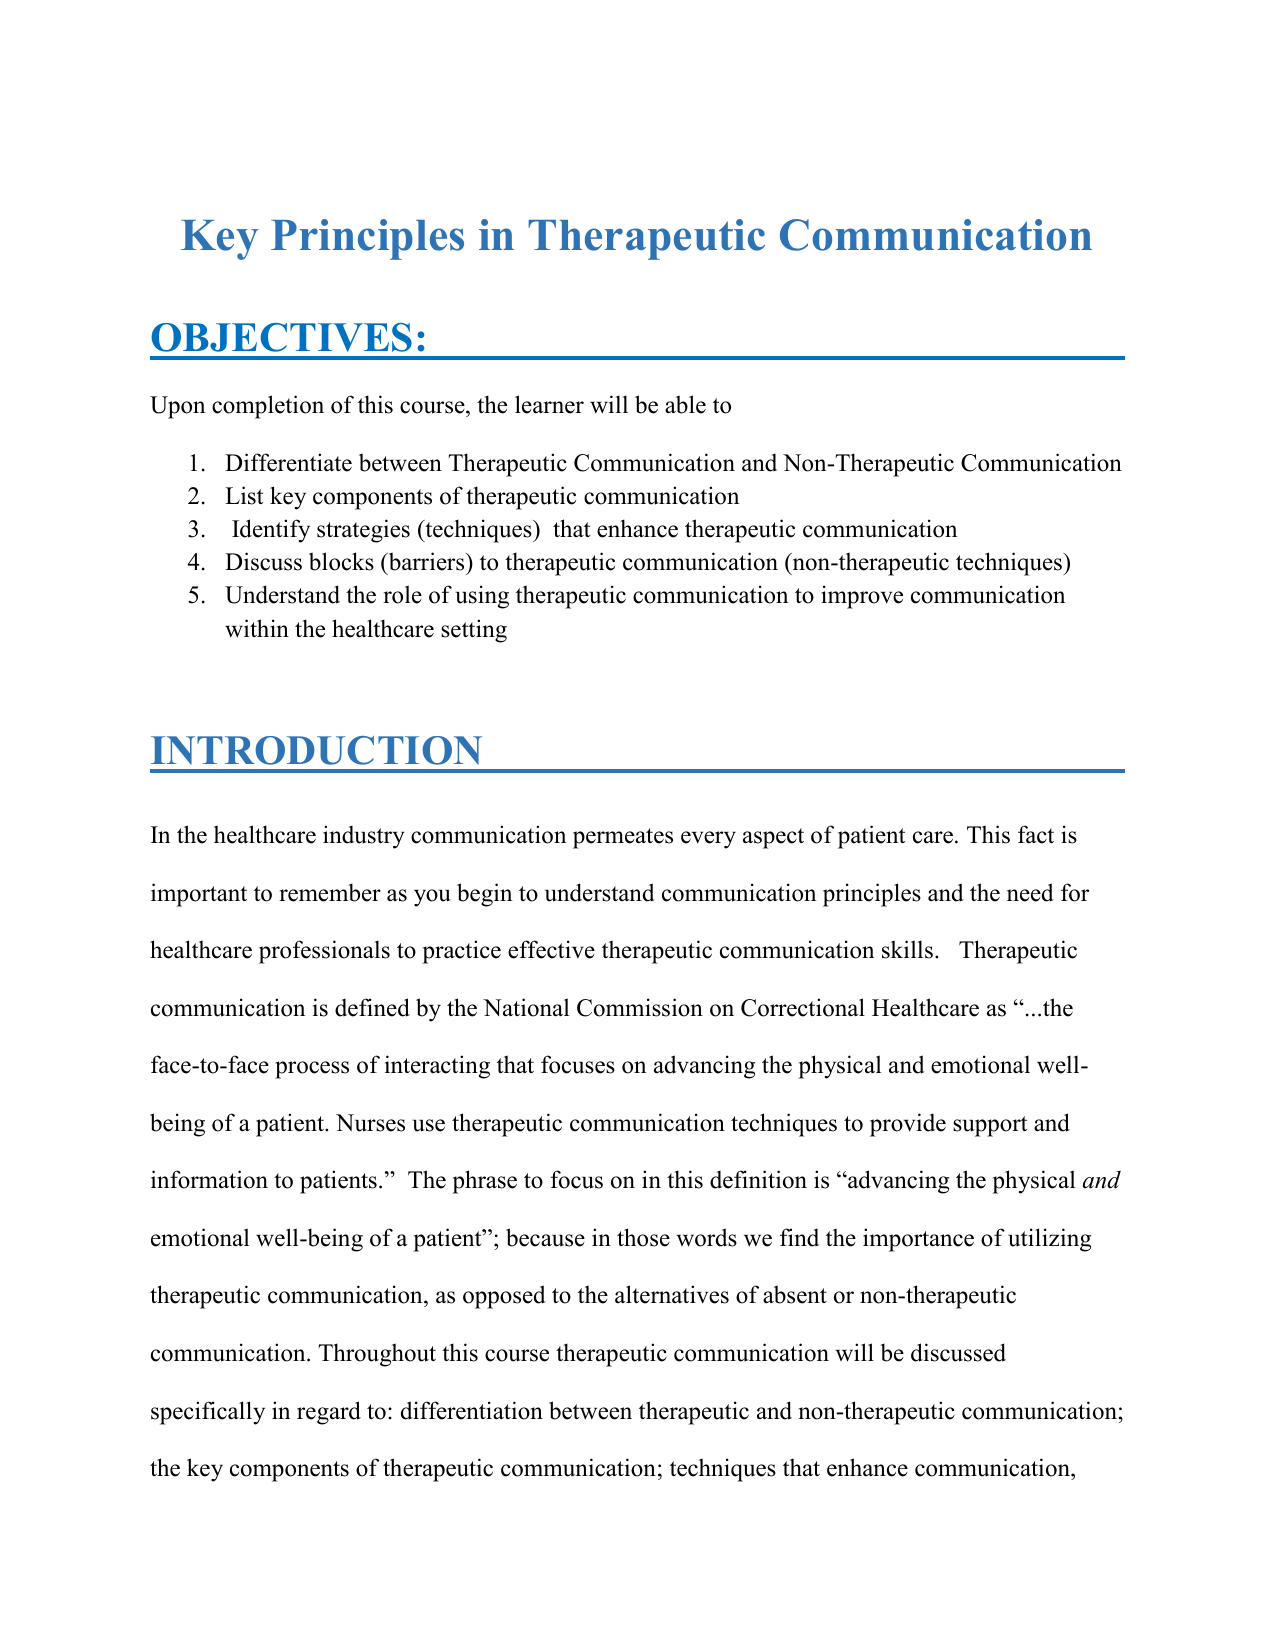 importance of therapeutic communication